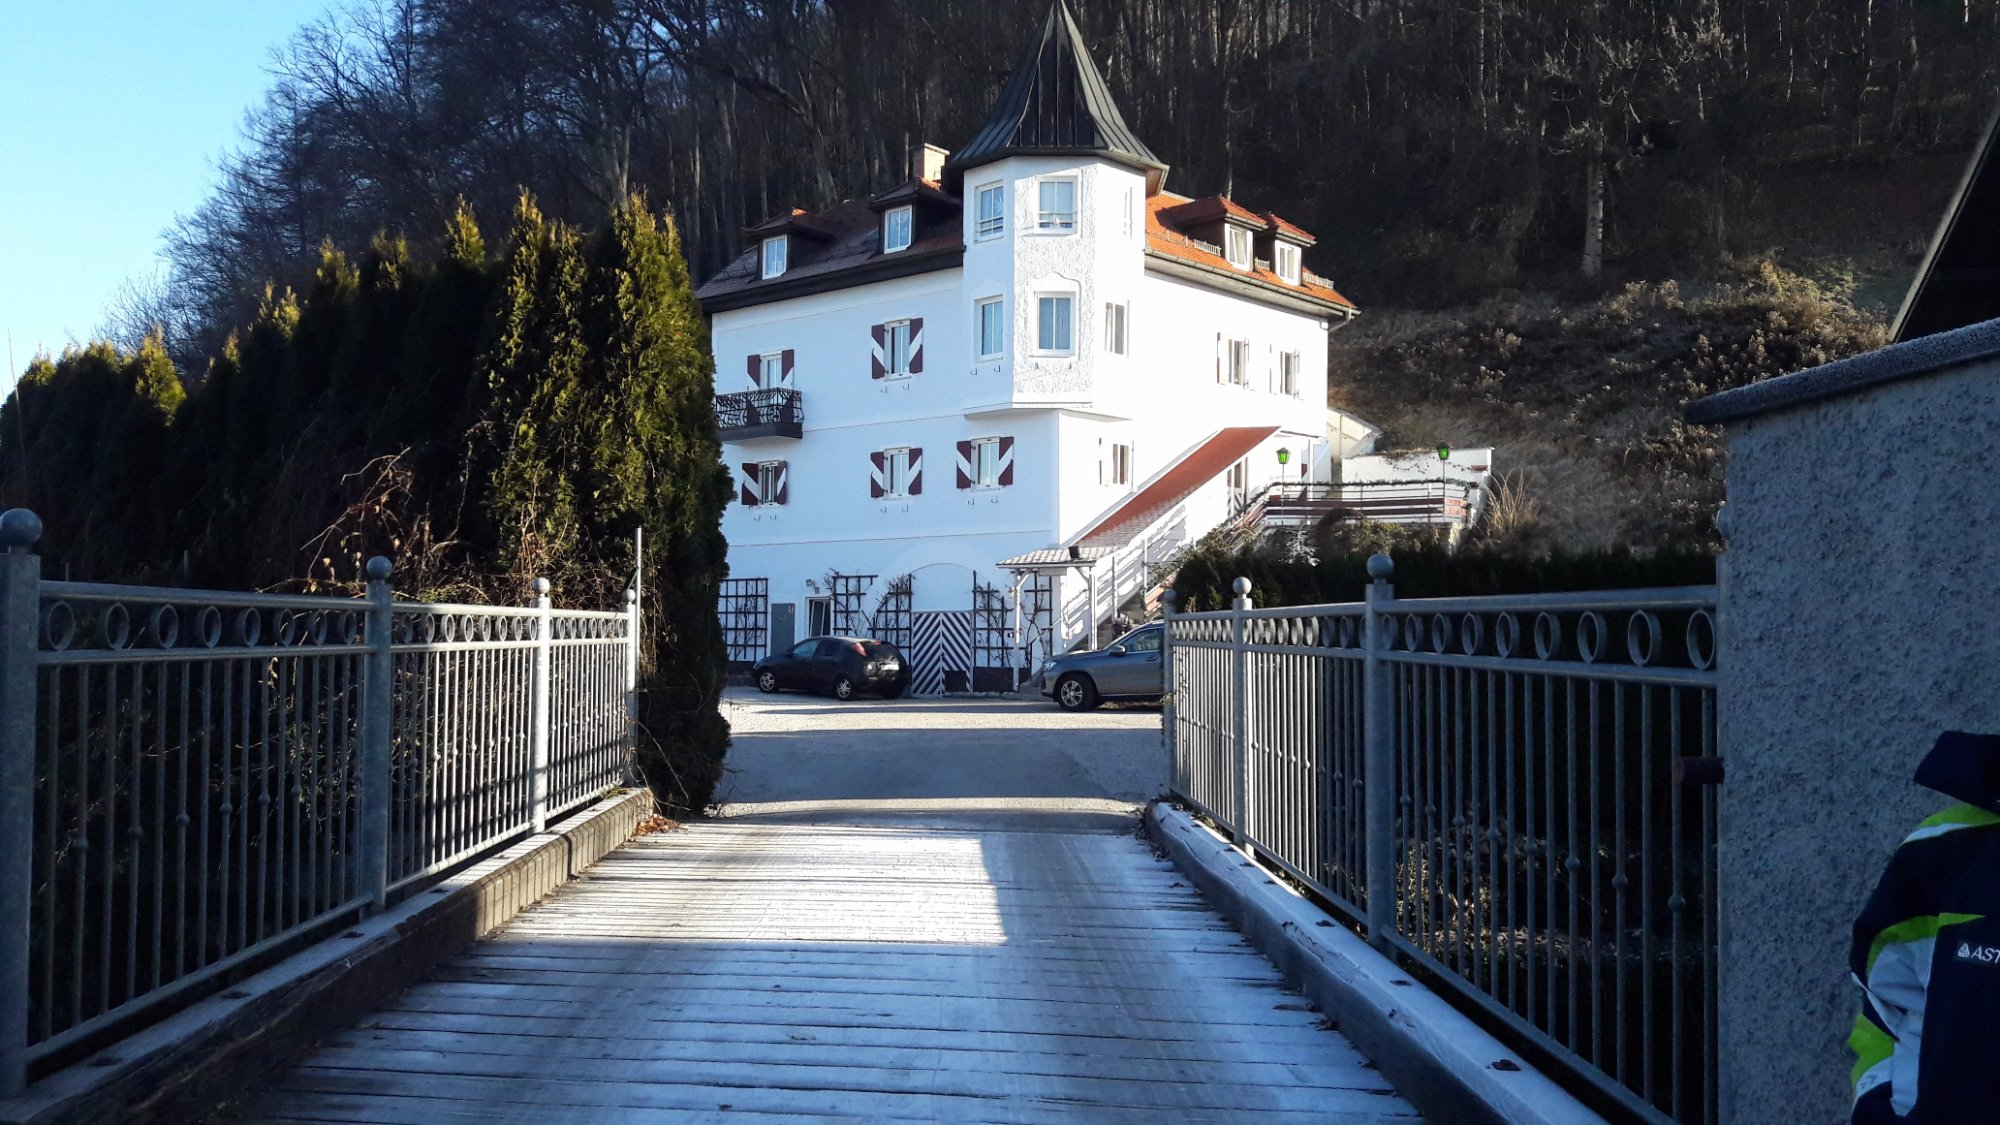 Hotel Turnerwirt